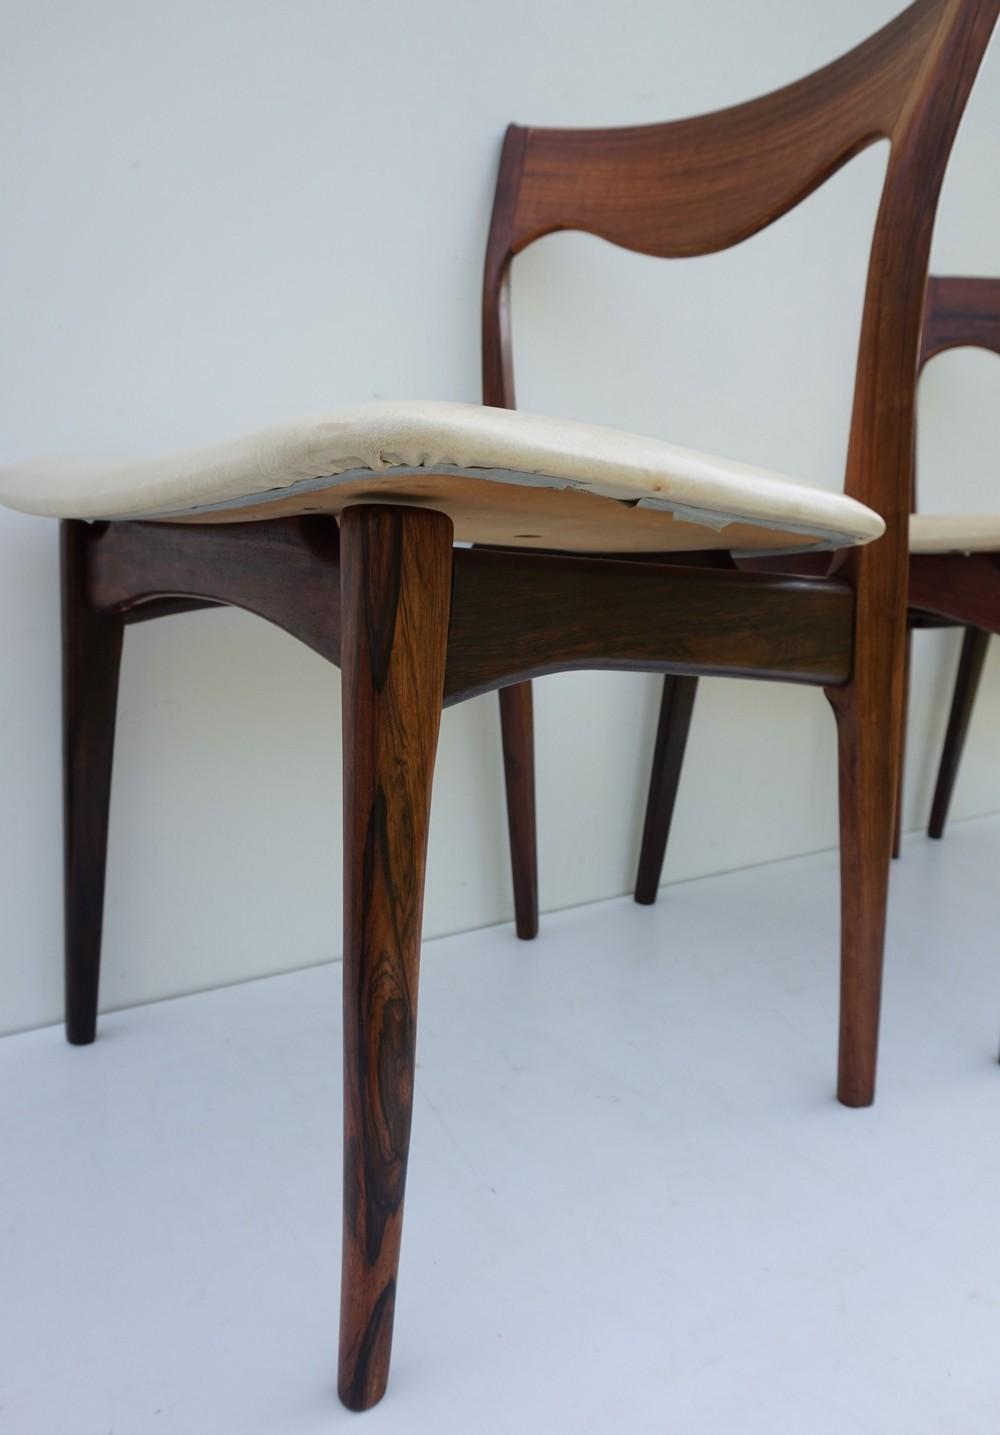 Palissander stoelen van het nederlandse merk awa naar for Merk stoelen